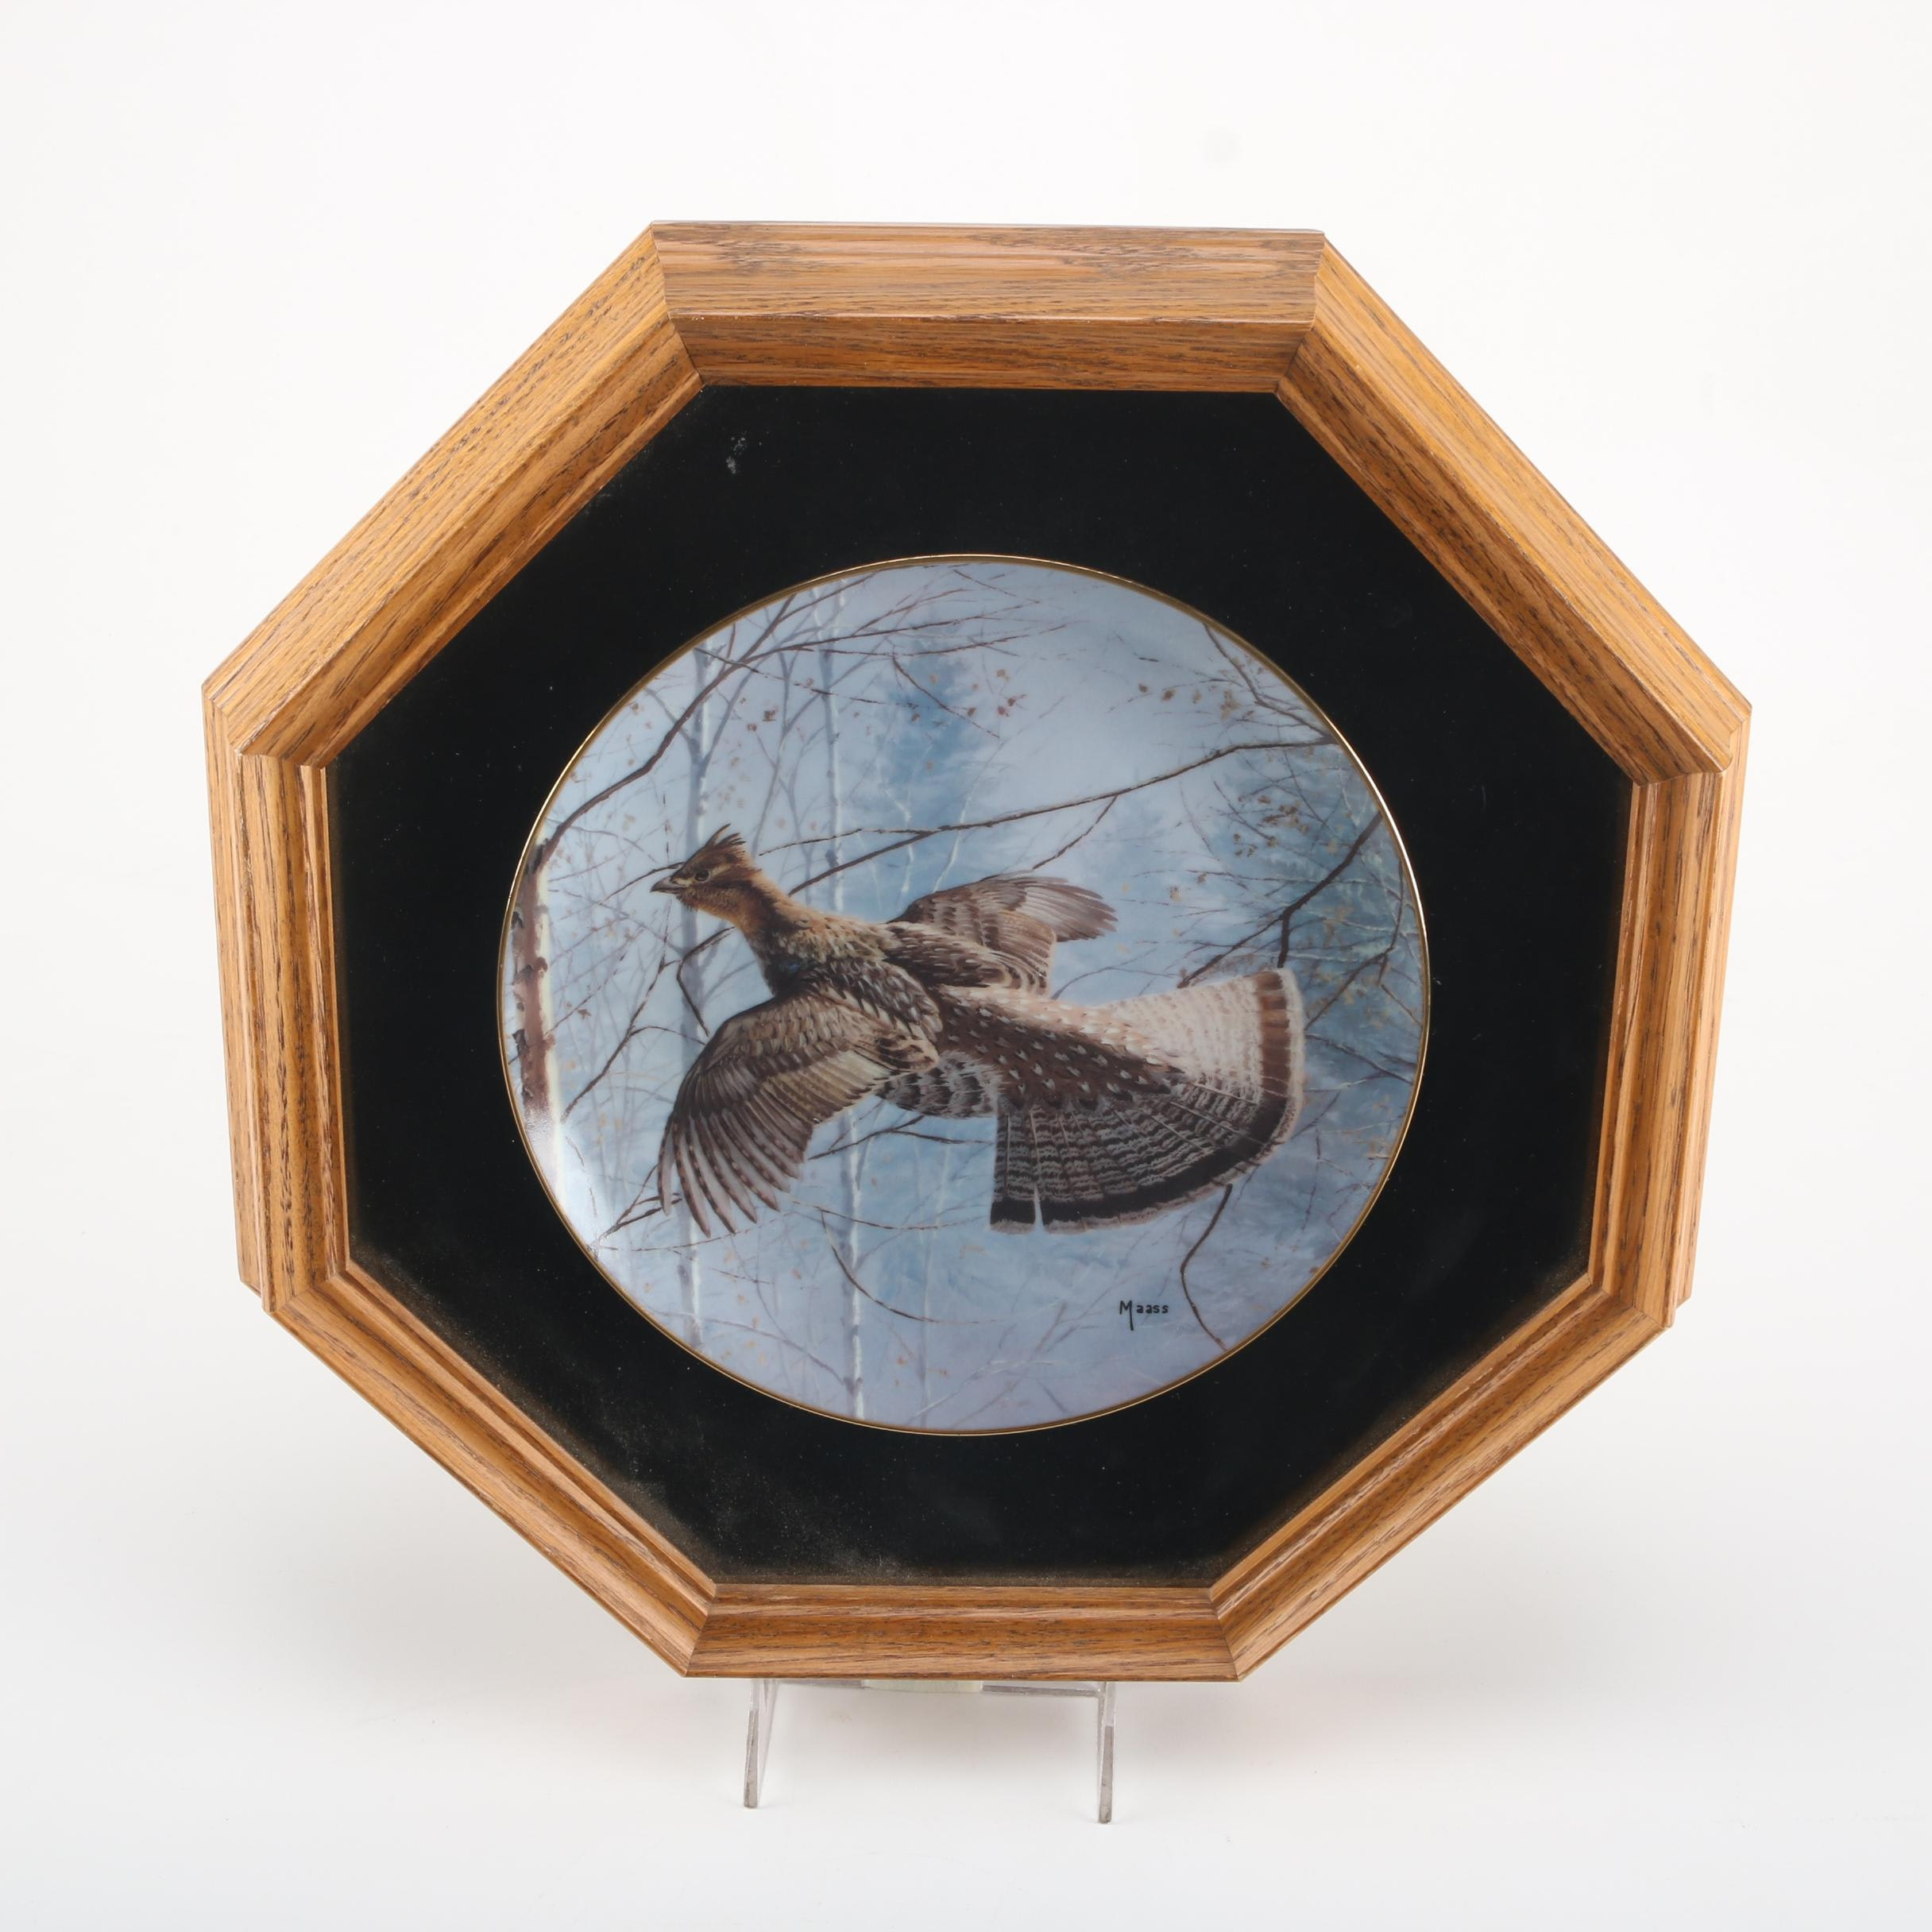 David A. Maass Commemorative Plate of Ruffed Grouse